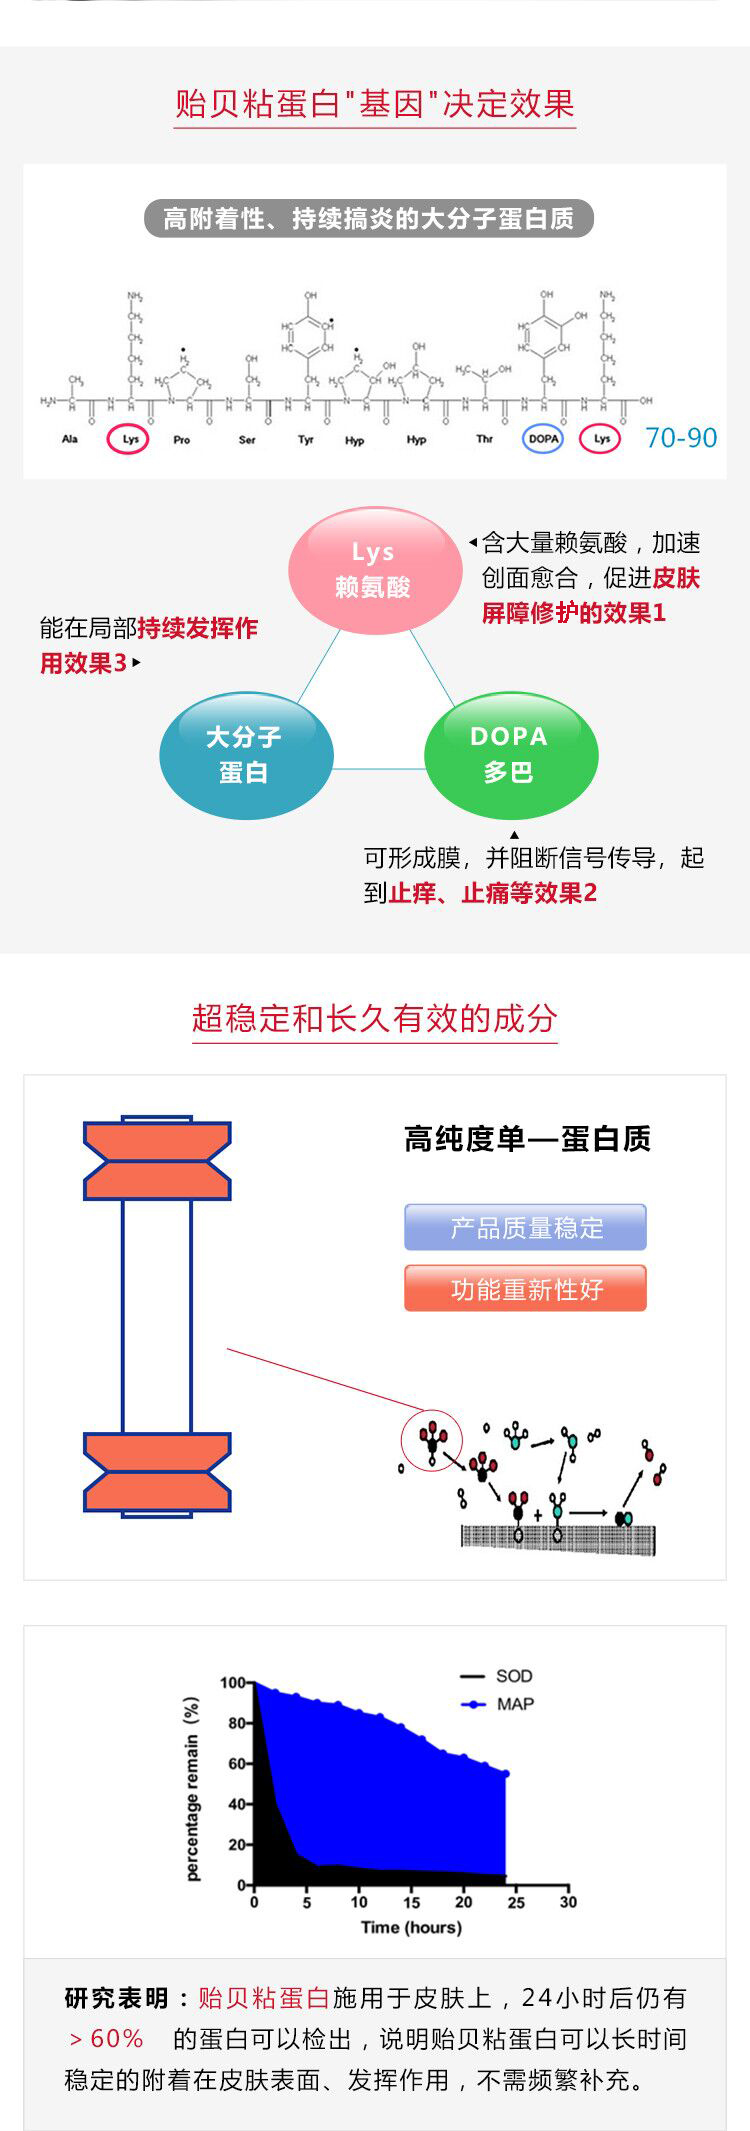 R002贻贝修护乳-PC_04.jpg